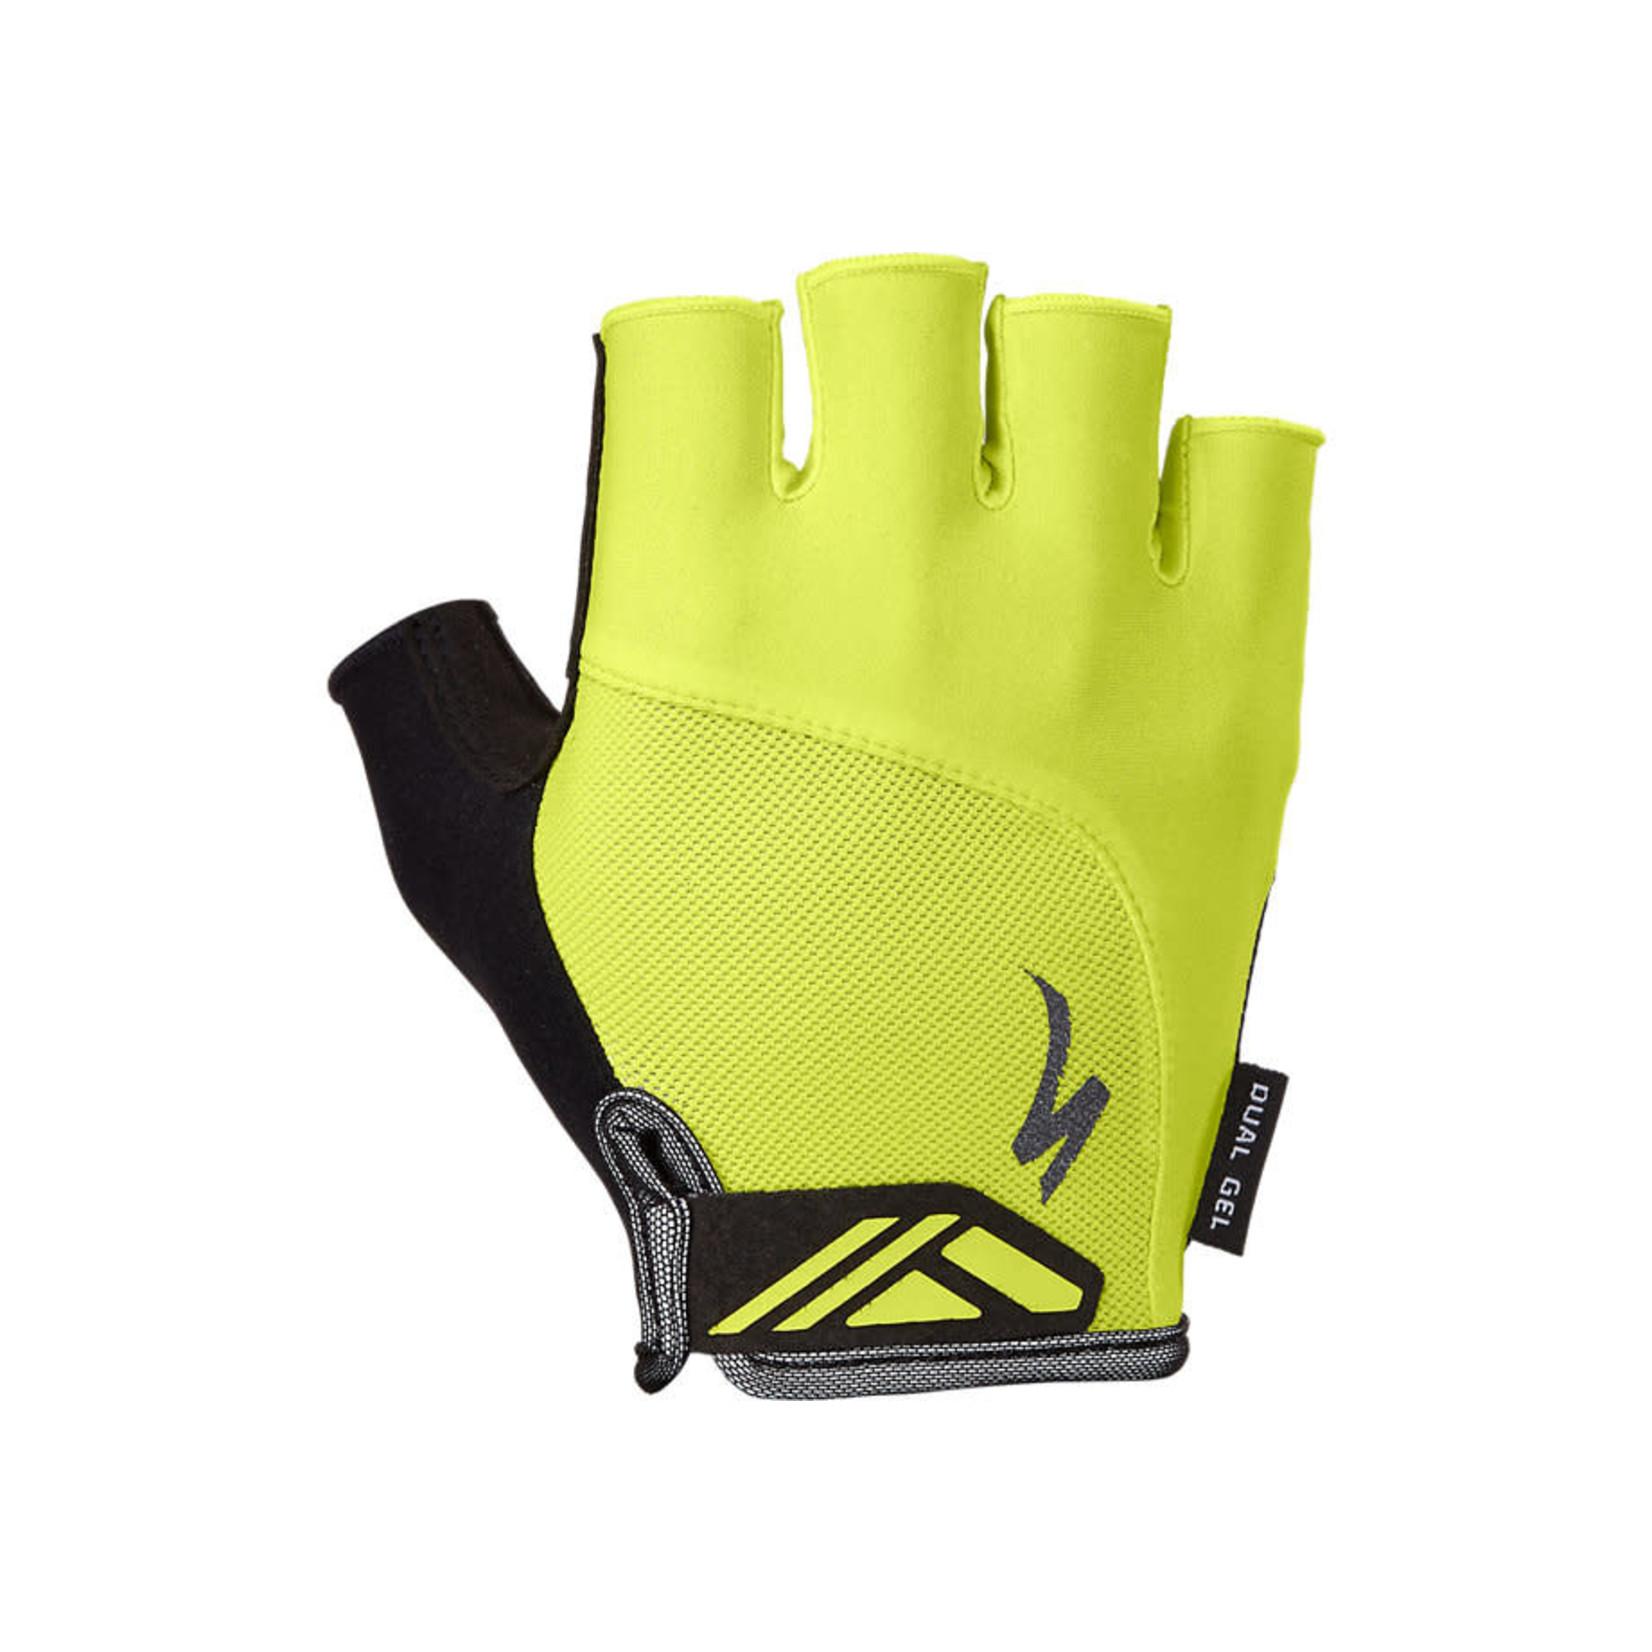 Specialized Specialized BG Dual Gel Gloves Men's